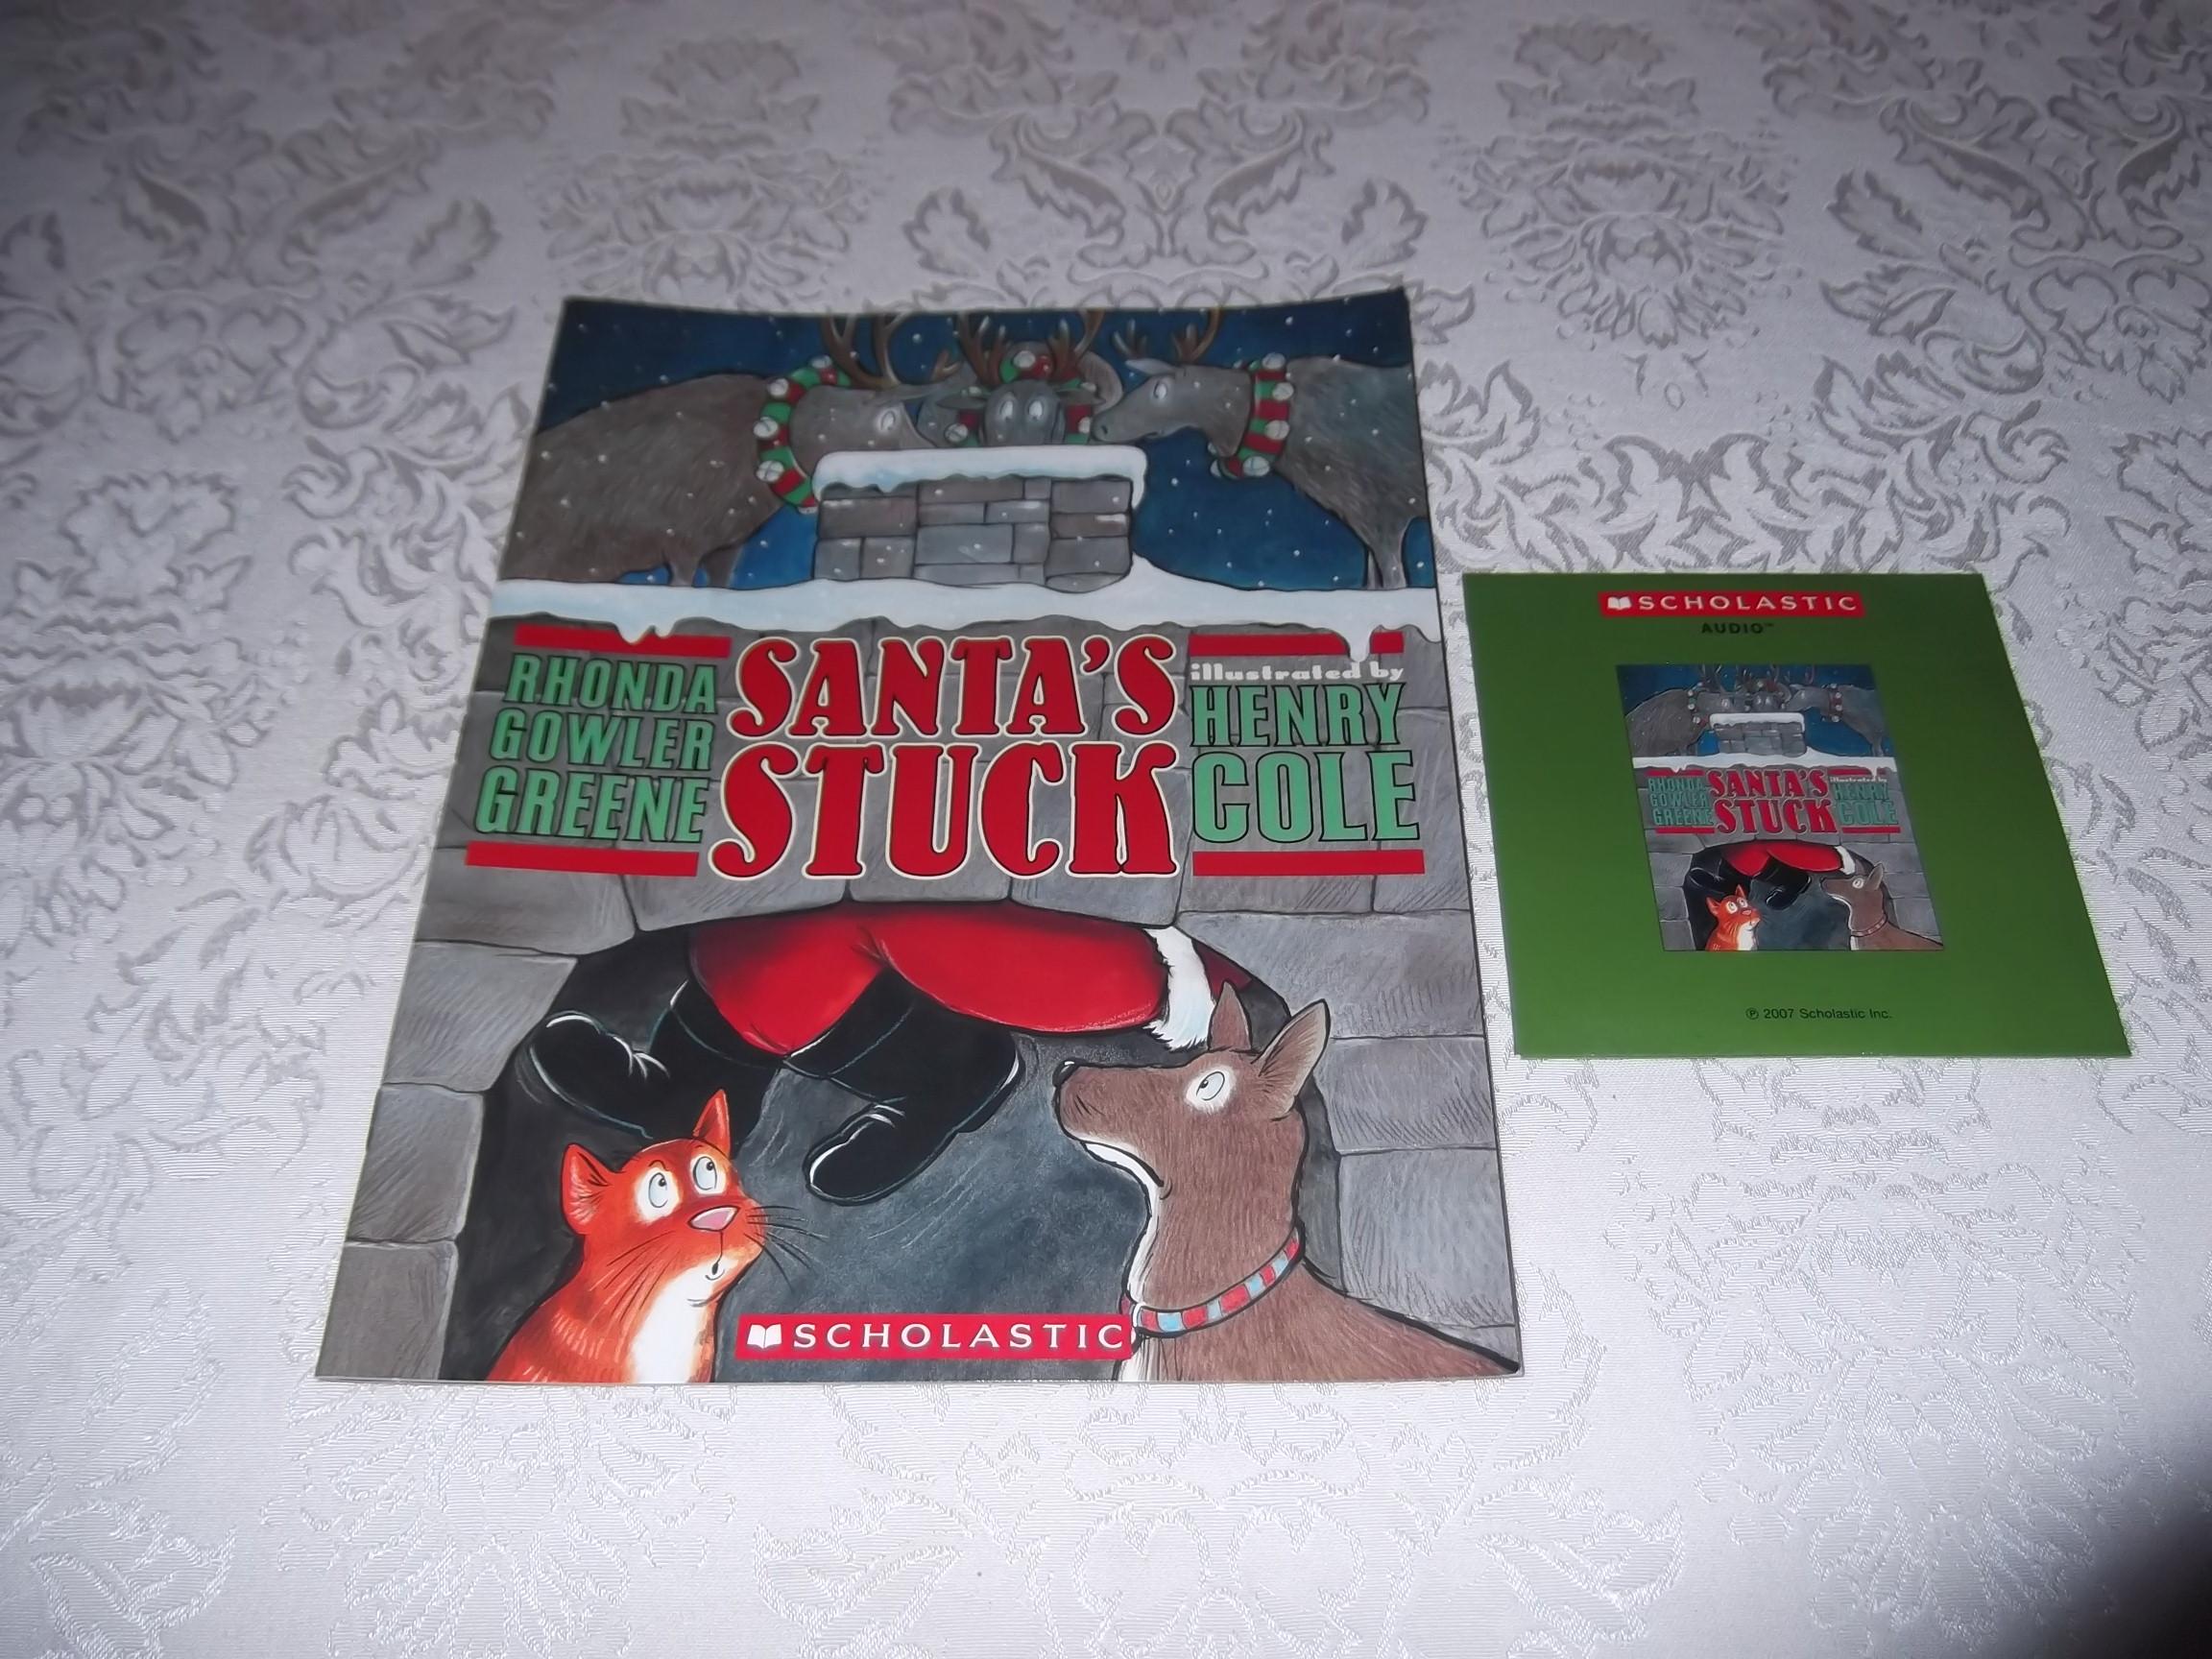 Santa's Stuck Brand New Audio CD & SC Rhonda Gowler Greene Henry Cole